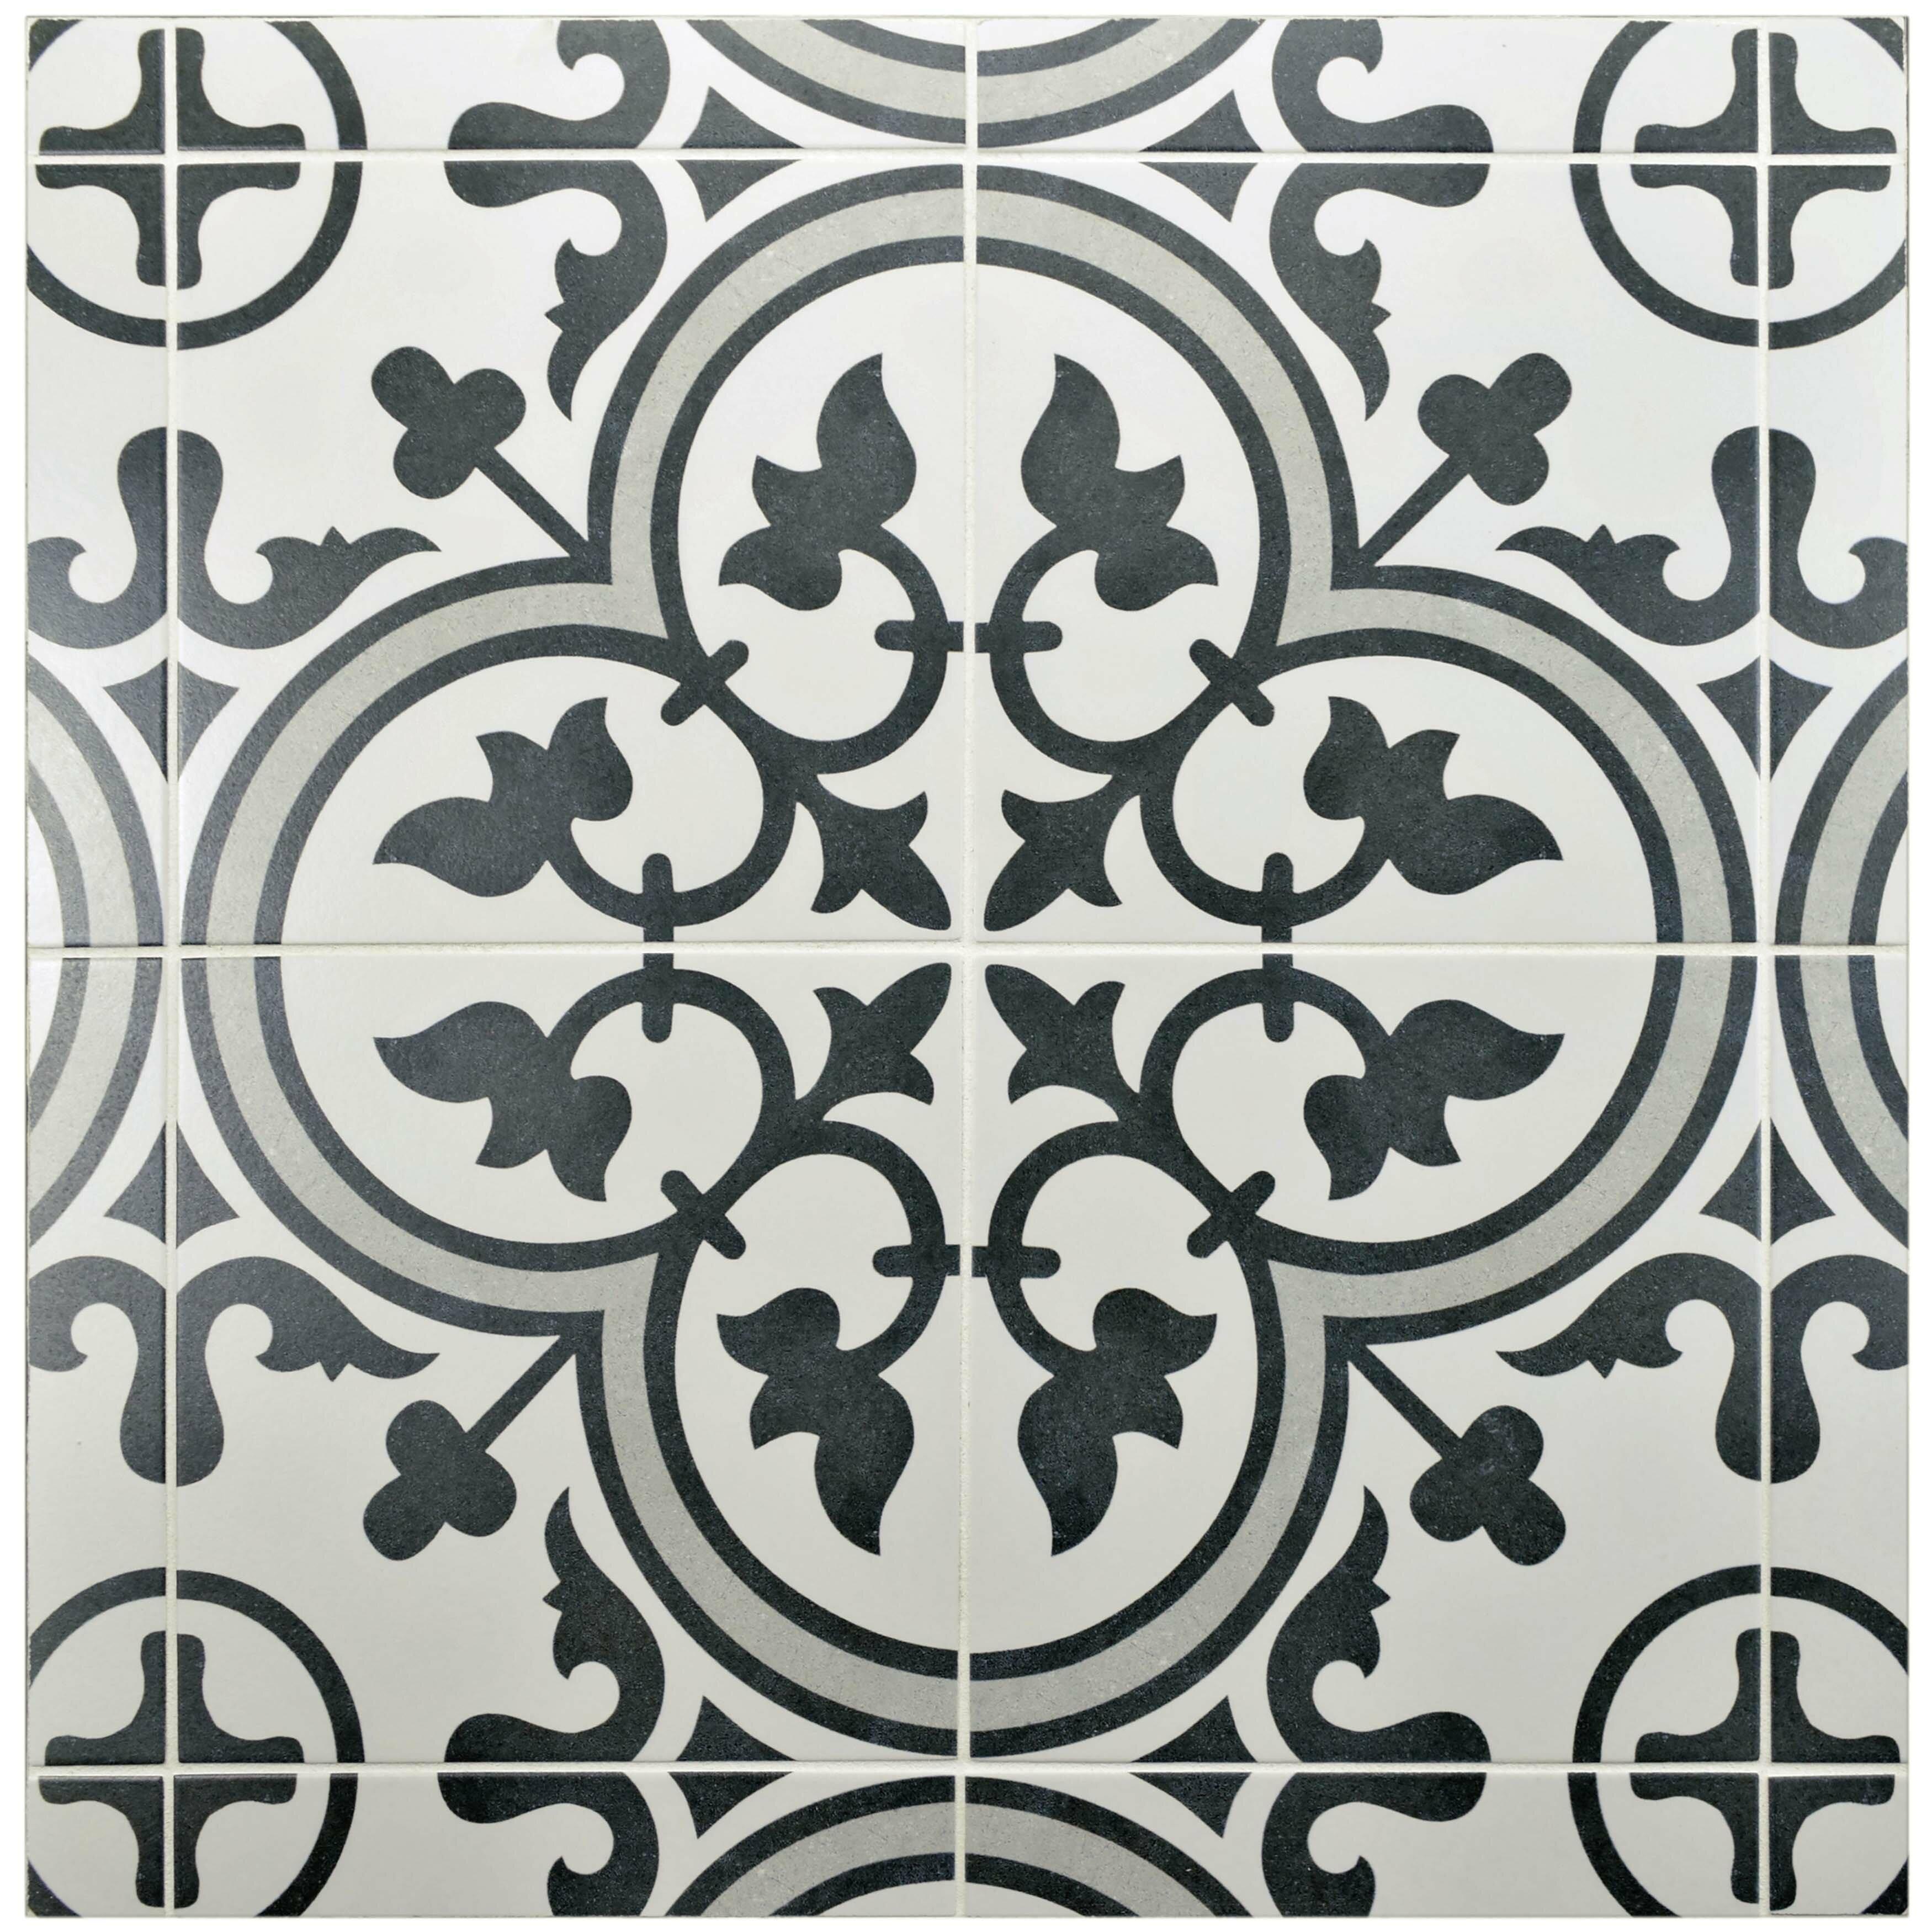 Elitetile allmodern artea 975 x 975 porcelain field tile in dark graywhite dailygadgetfo Choice Image